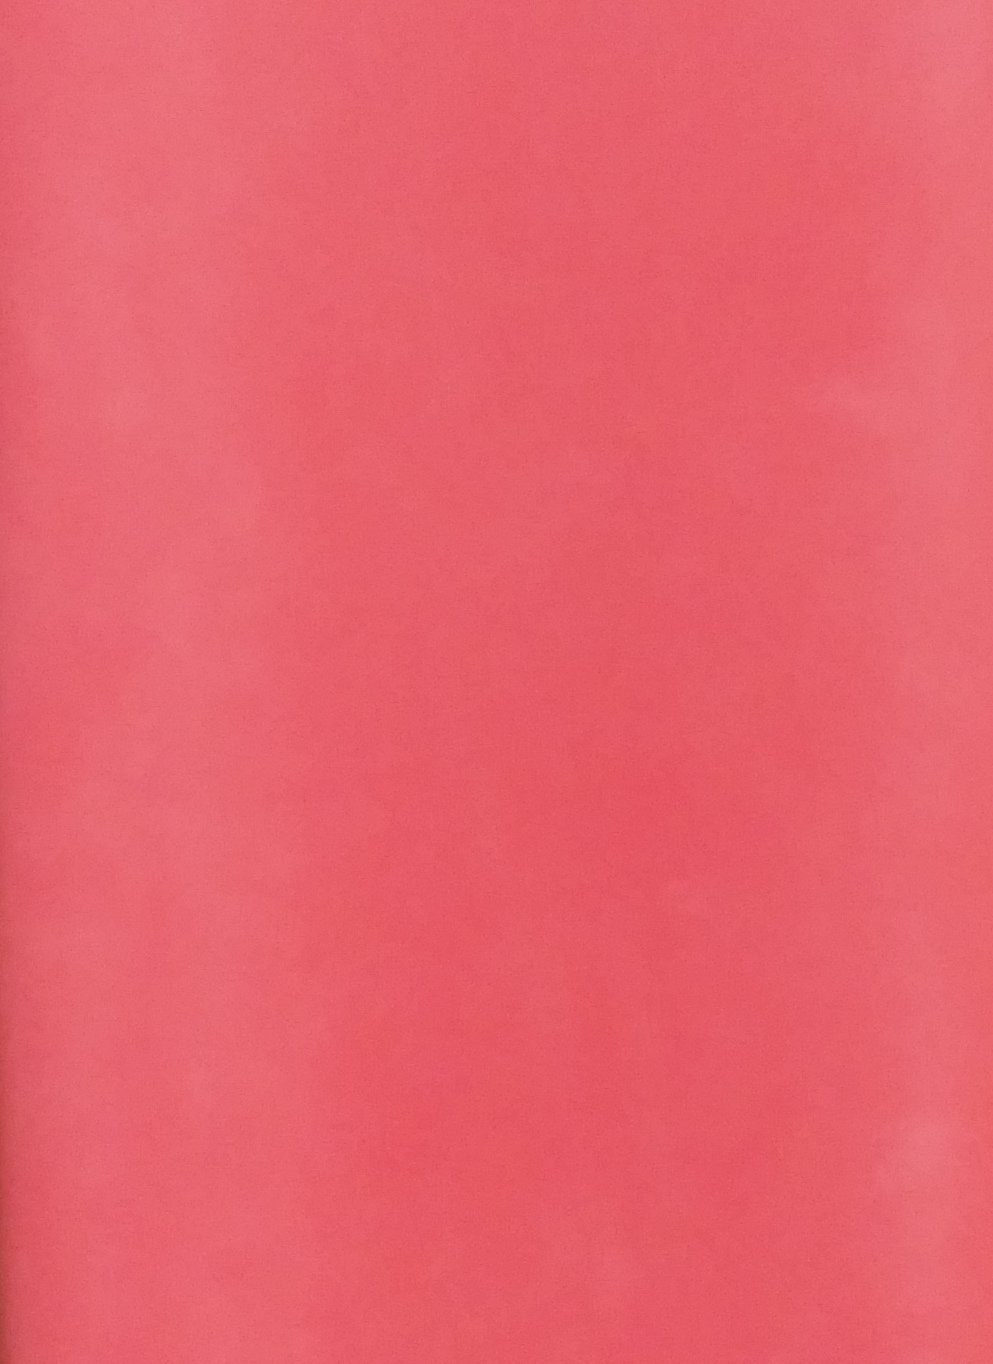 BuyHeatShrink 1/4'' 2:1 Polyolefin Heat shrink Tubing (250ft/spool) - Red